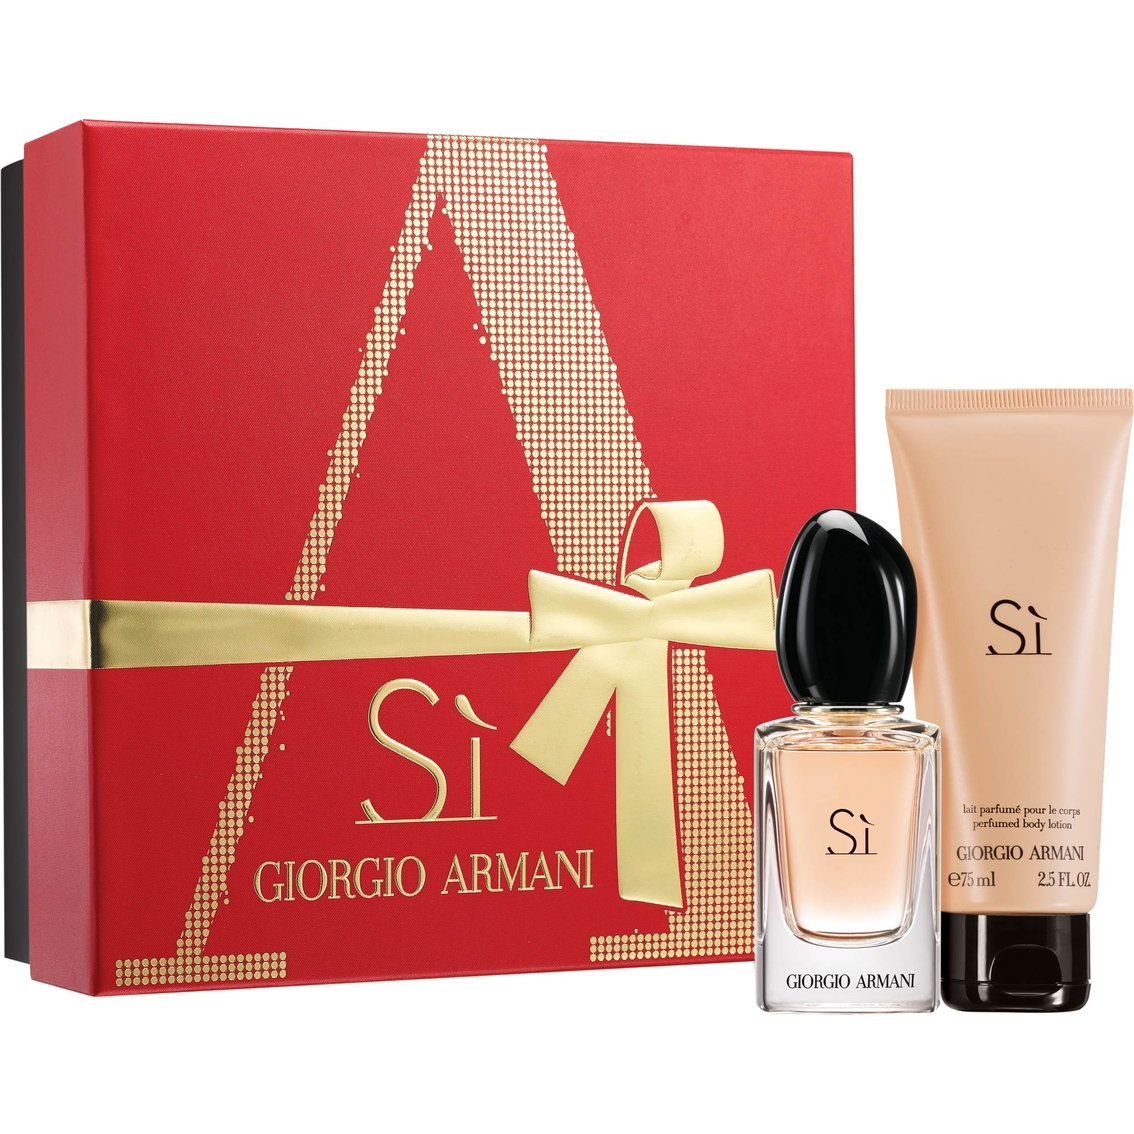 Giorgio Armani Si Eau De Parfum 2 Pc Set Gifts Sets For Her